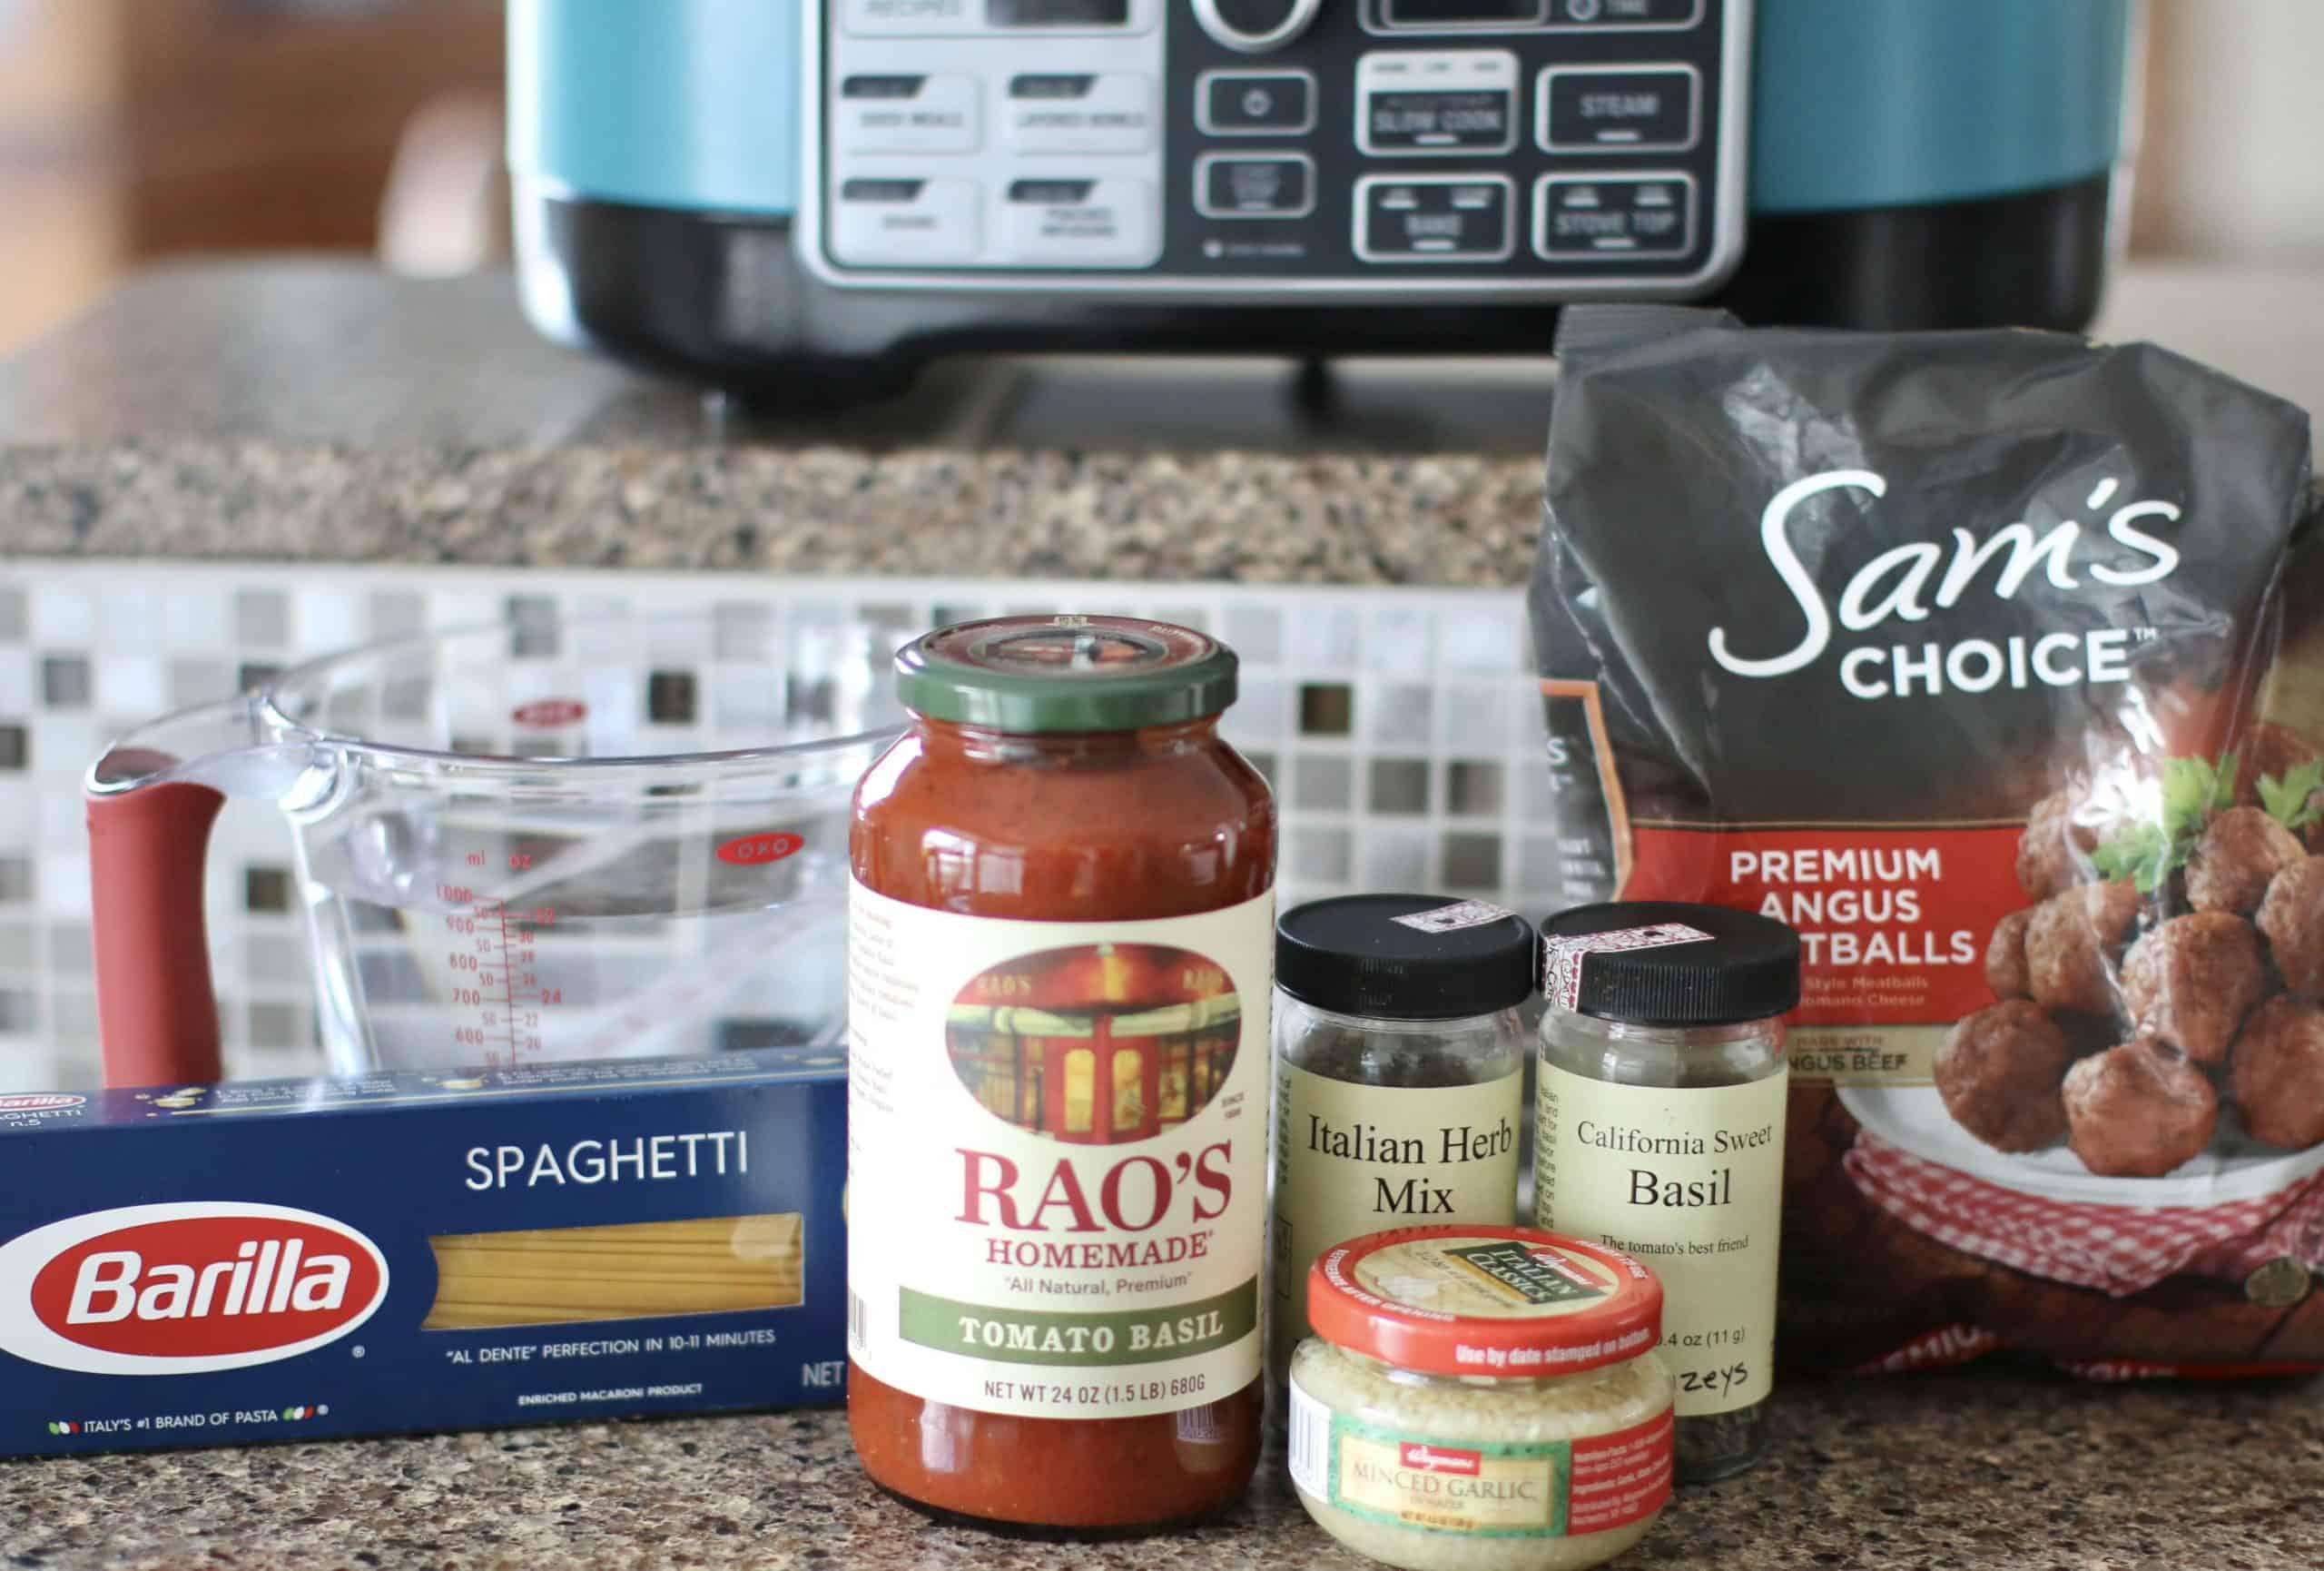 Crock Pot Spaghetti and Meatballs ingredients: spaghetti sauce, frozen meatballs, water, Italian seasoning, minced garlic, dried basil,spaghetti noodles, olive oil